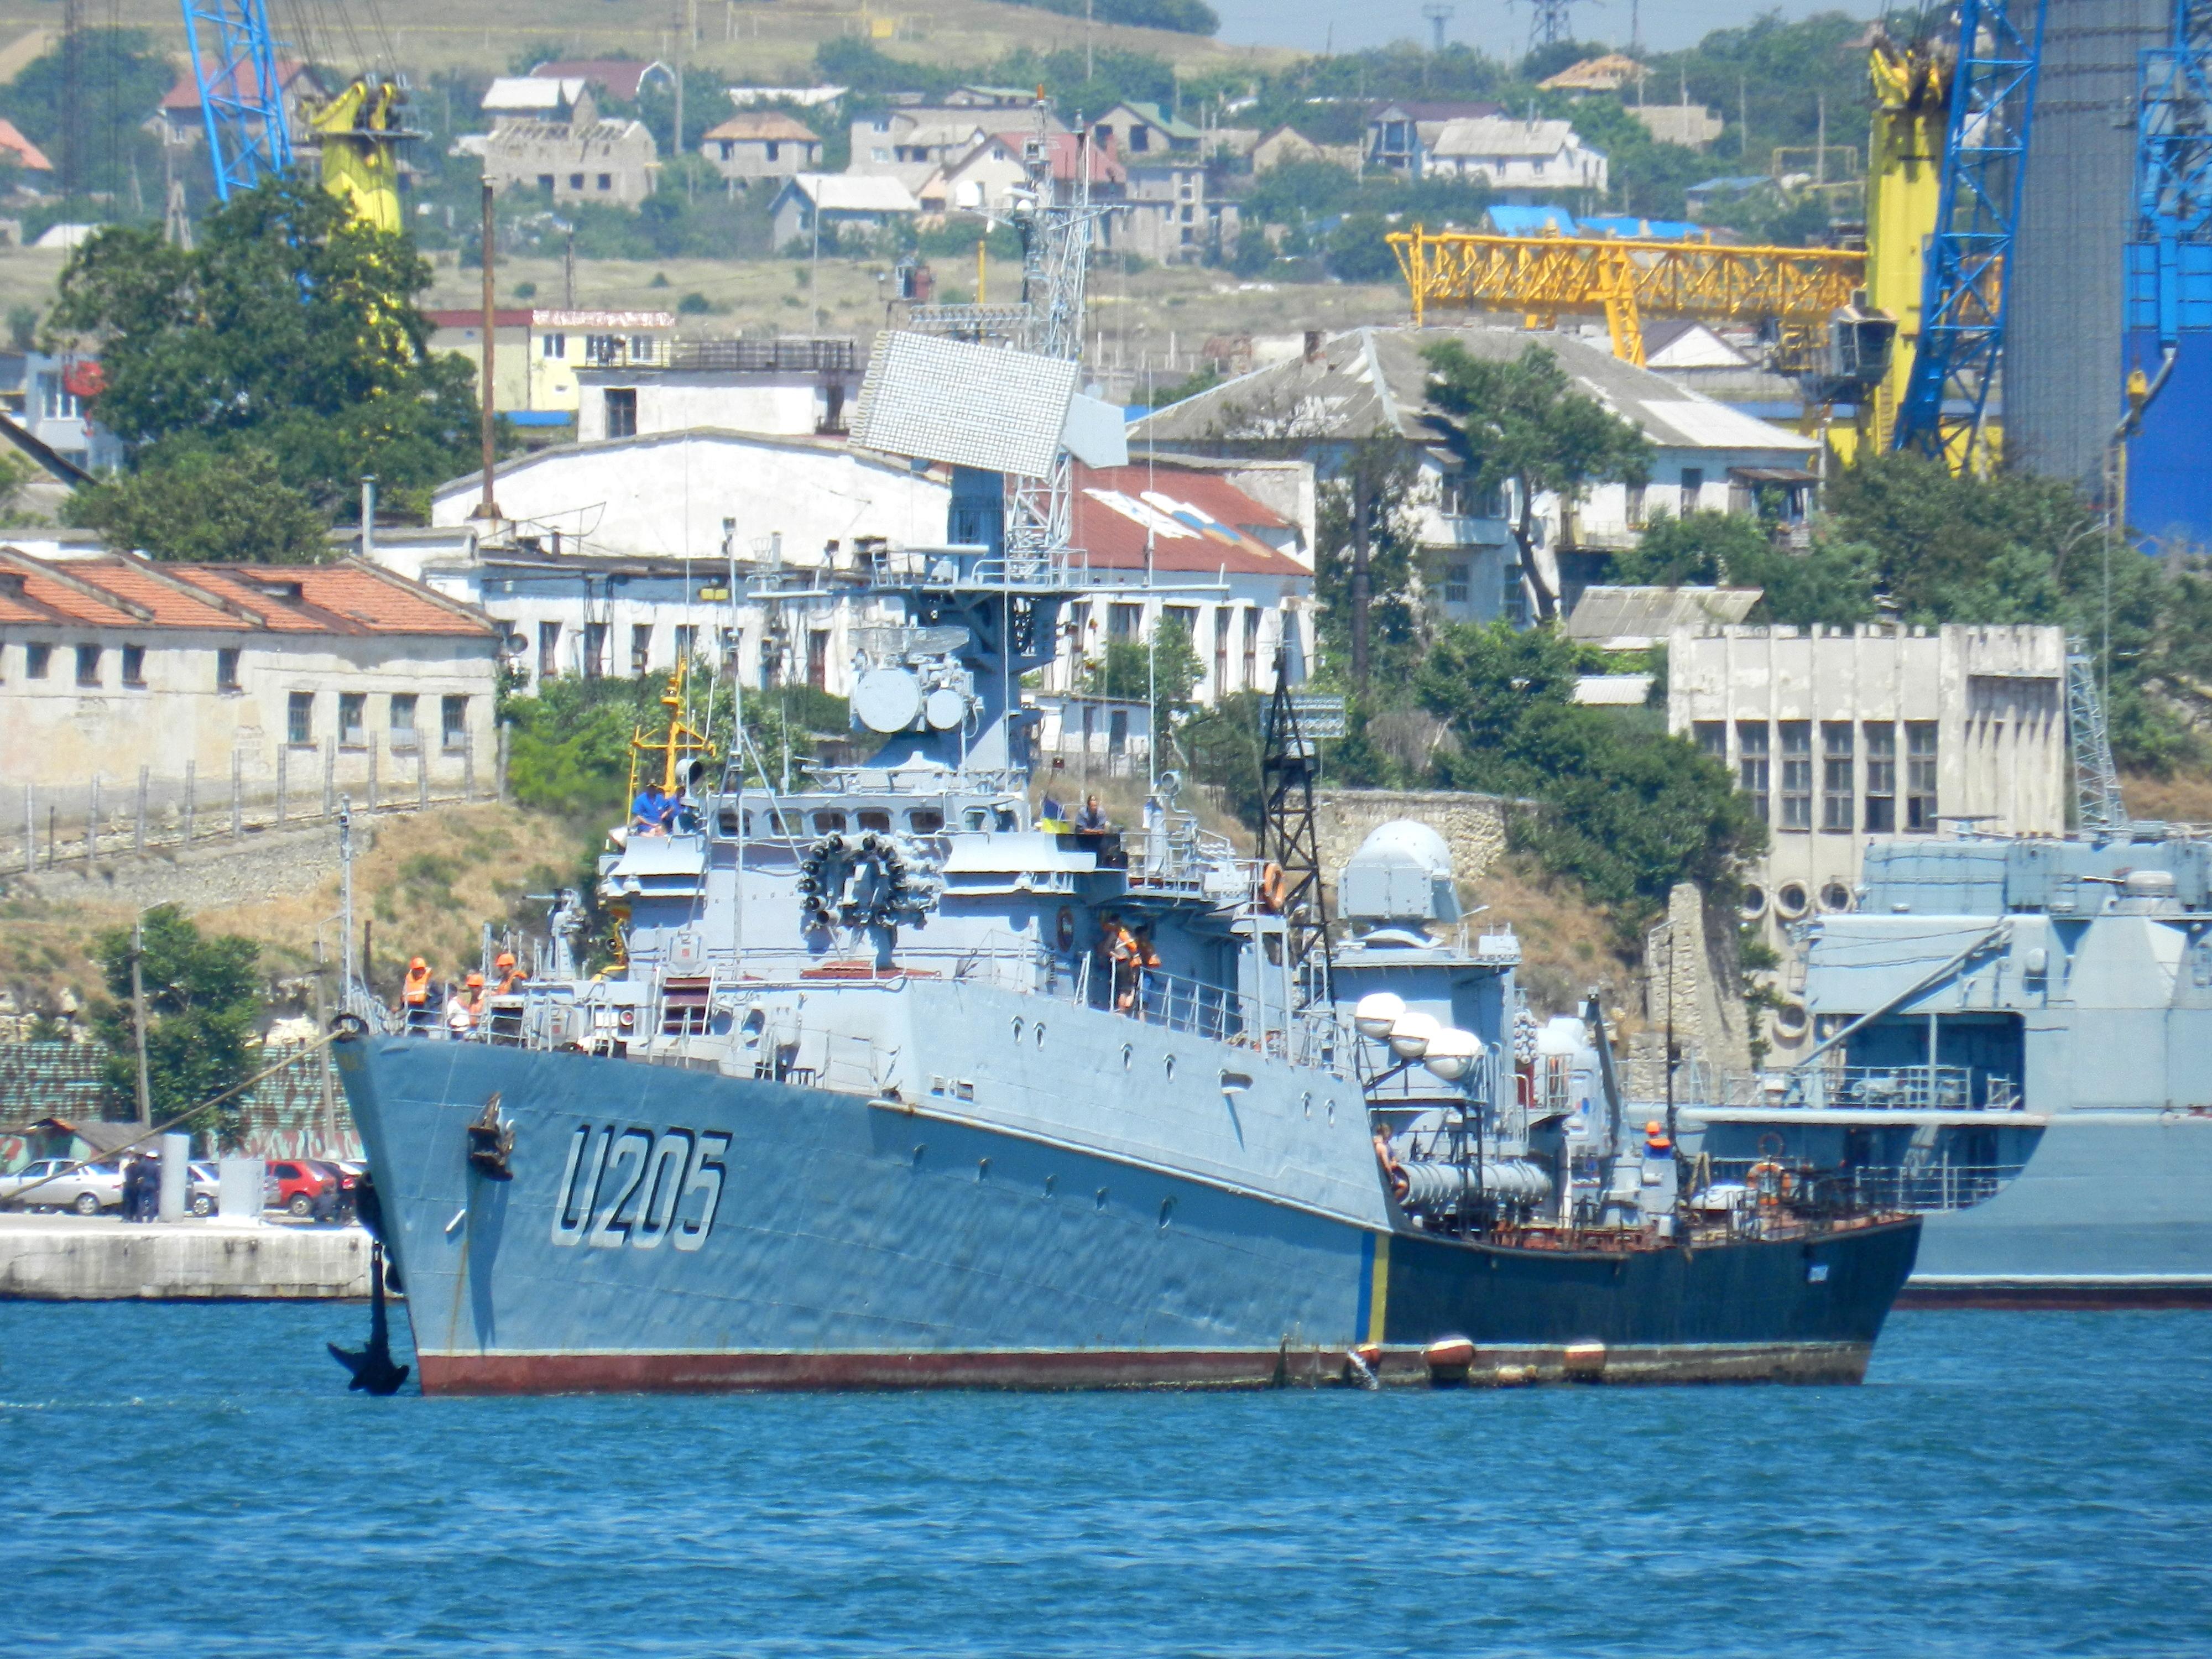 Ukrainian Armed Forces / Zbroyni Syly Ukrayiny - Page 2 1329289